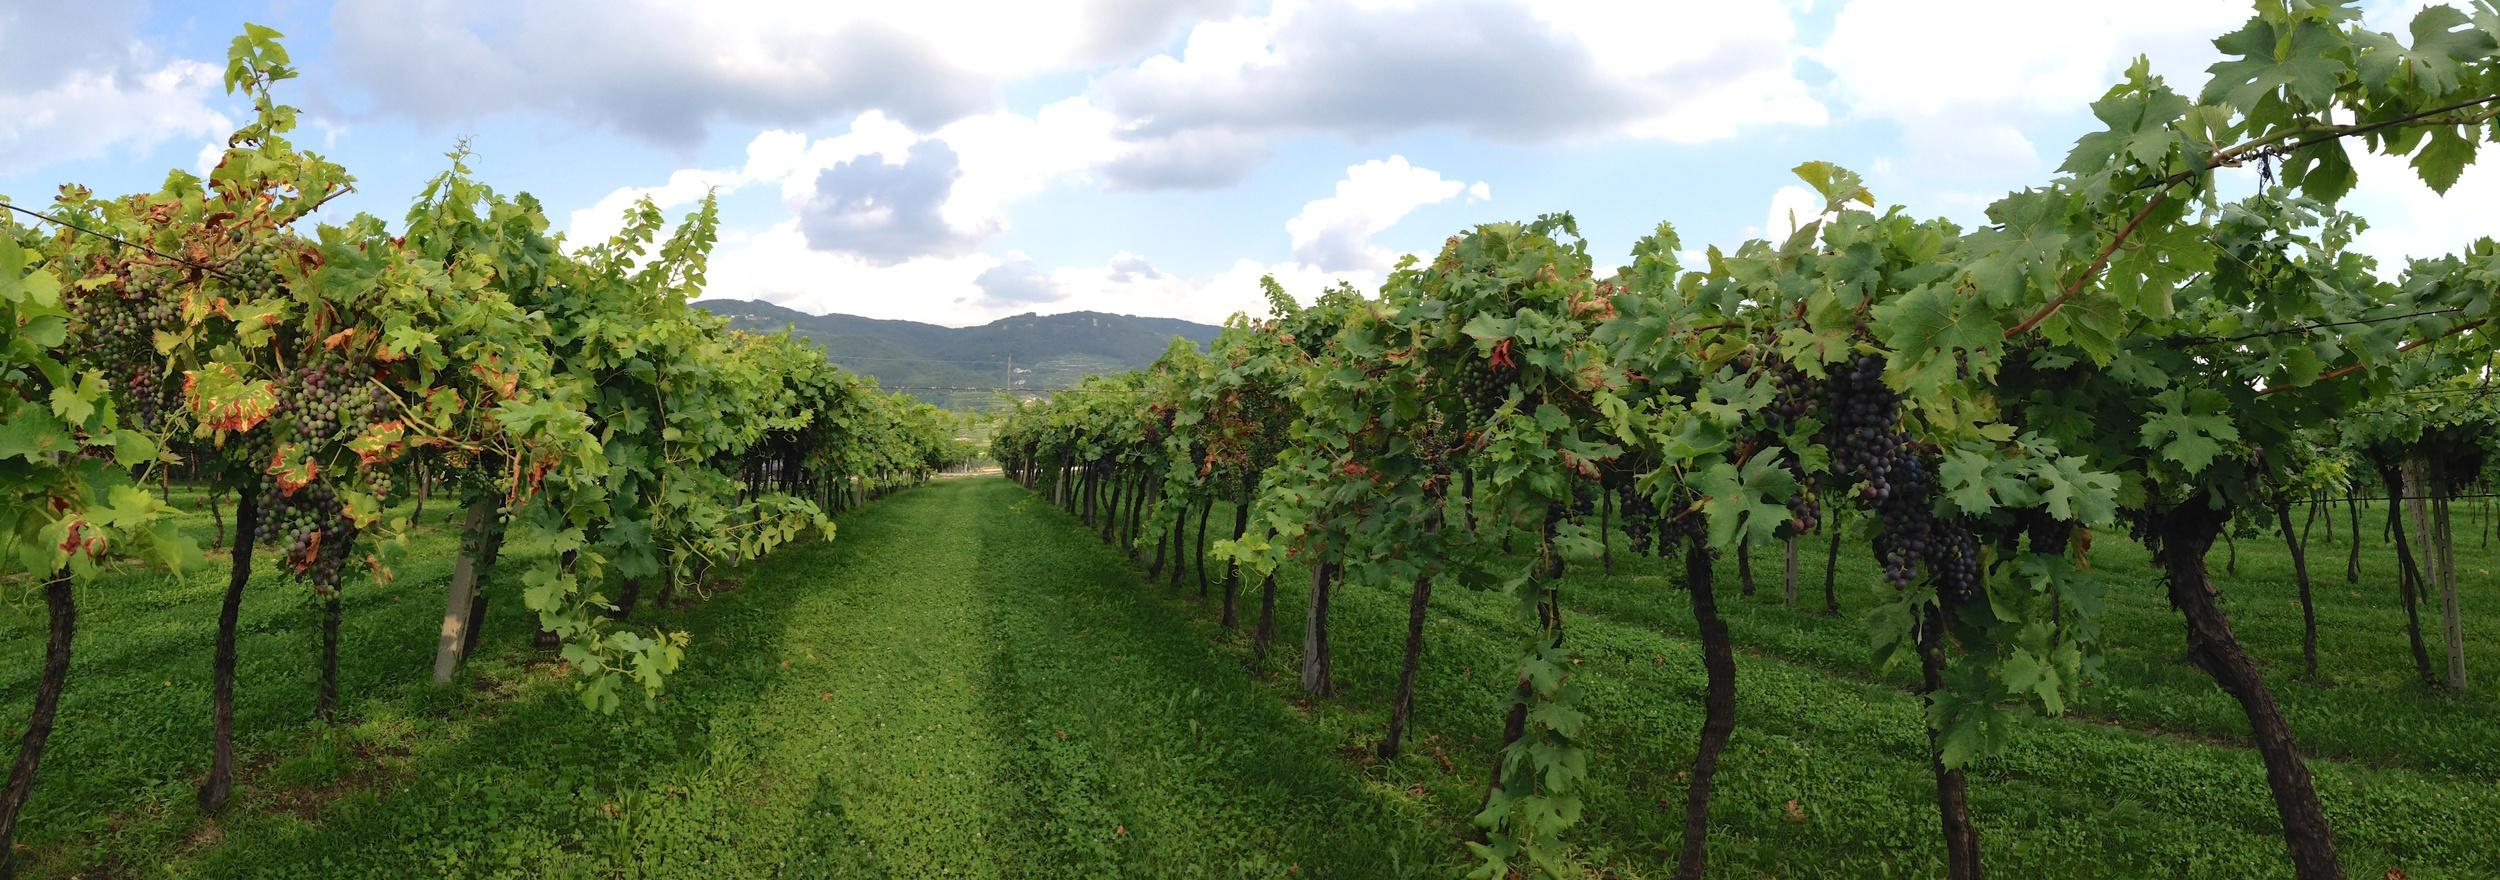 Preparing for the harvest 2014: an old vineyard in Jago cru, near  Negrar , Valpolicella